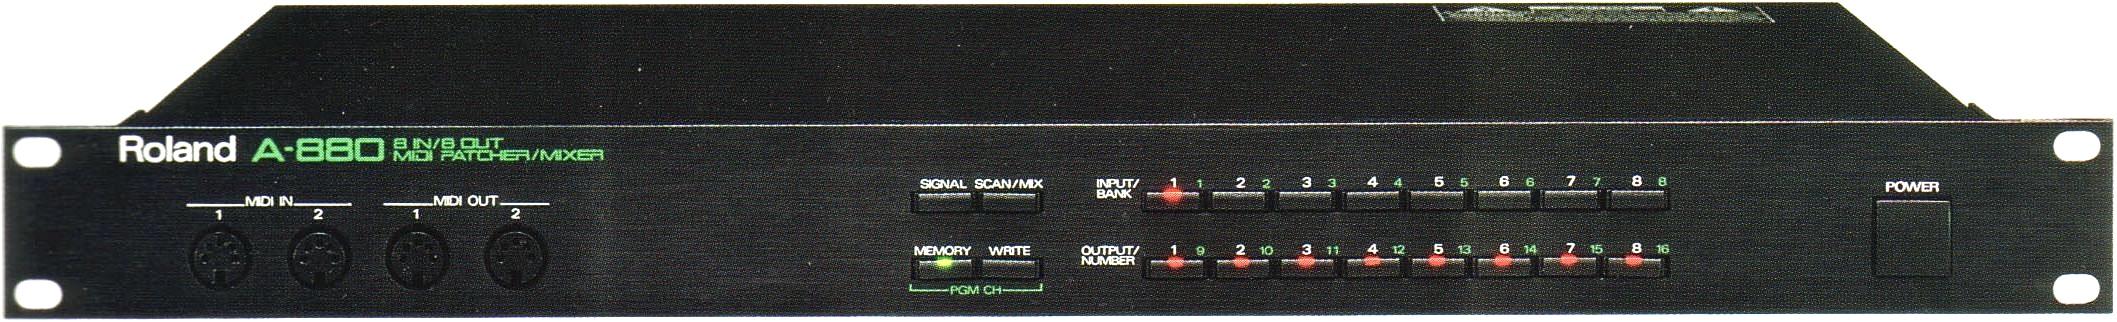 https://medias.audiofanzine.com/images/normal/fonctionnalites-audiofanzine-2992235.jpeg